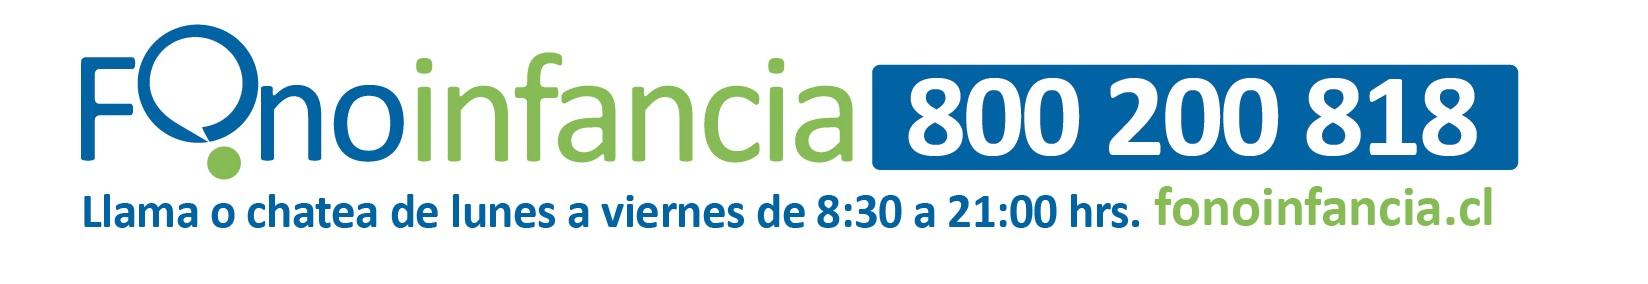 Logo-Fonoinfancia-Alargado